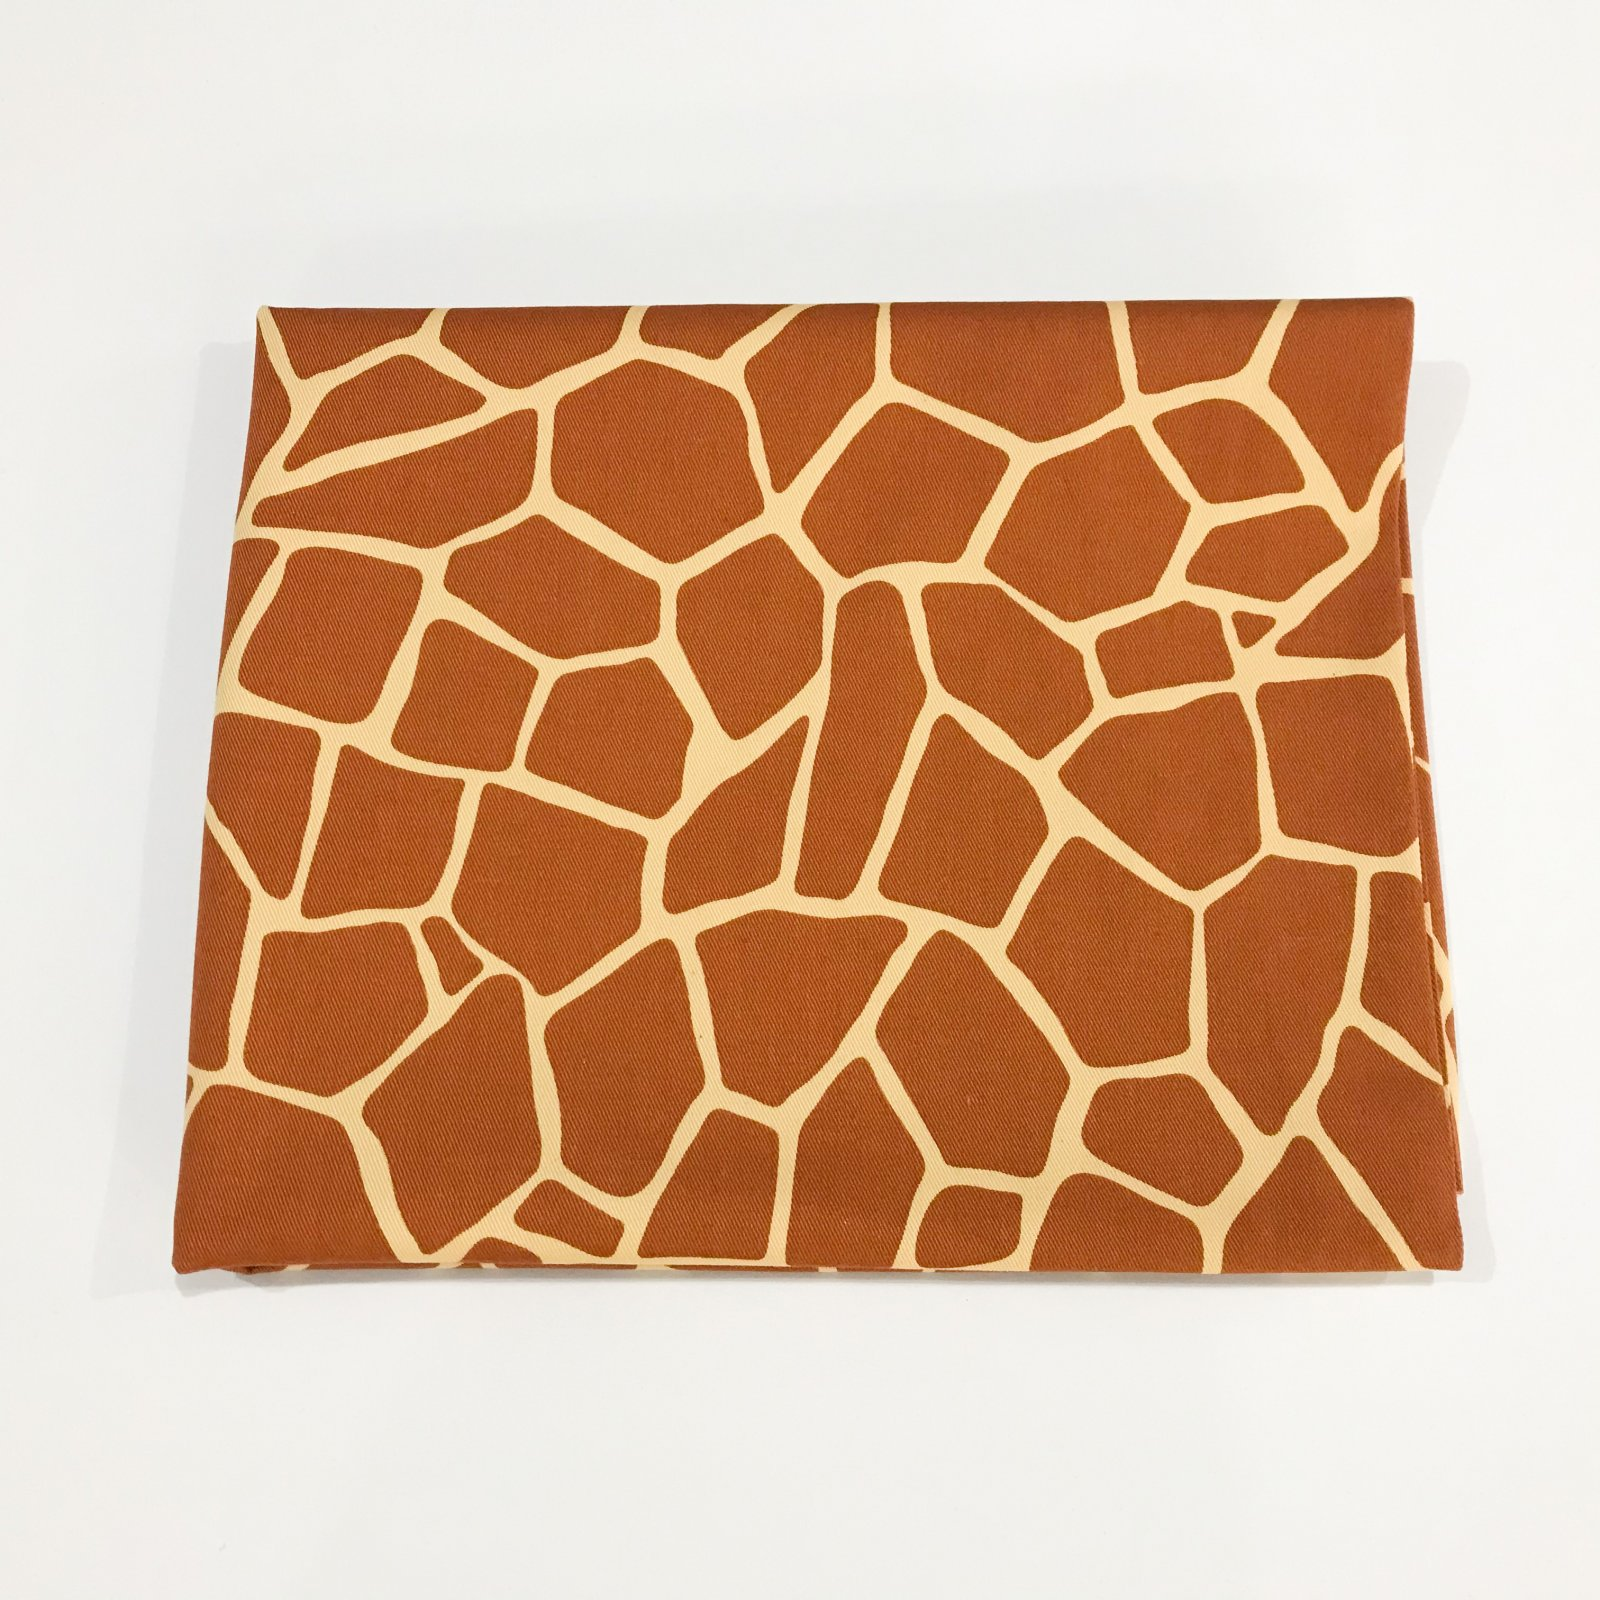 1 yard - Cotton Japanese Giraffe Print Twill